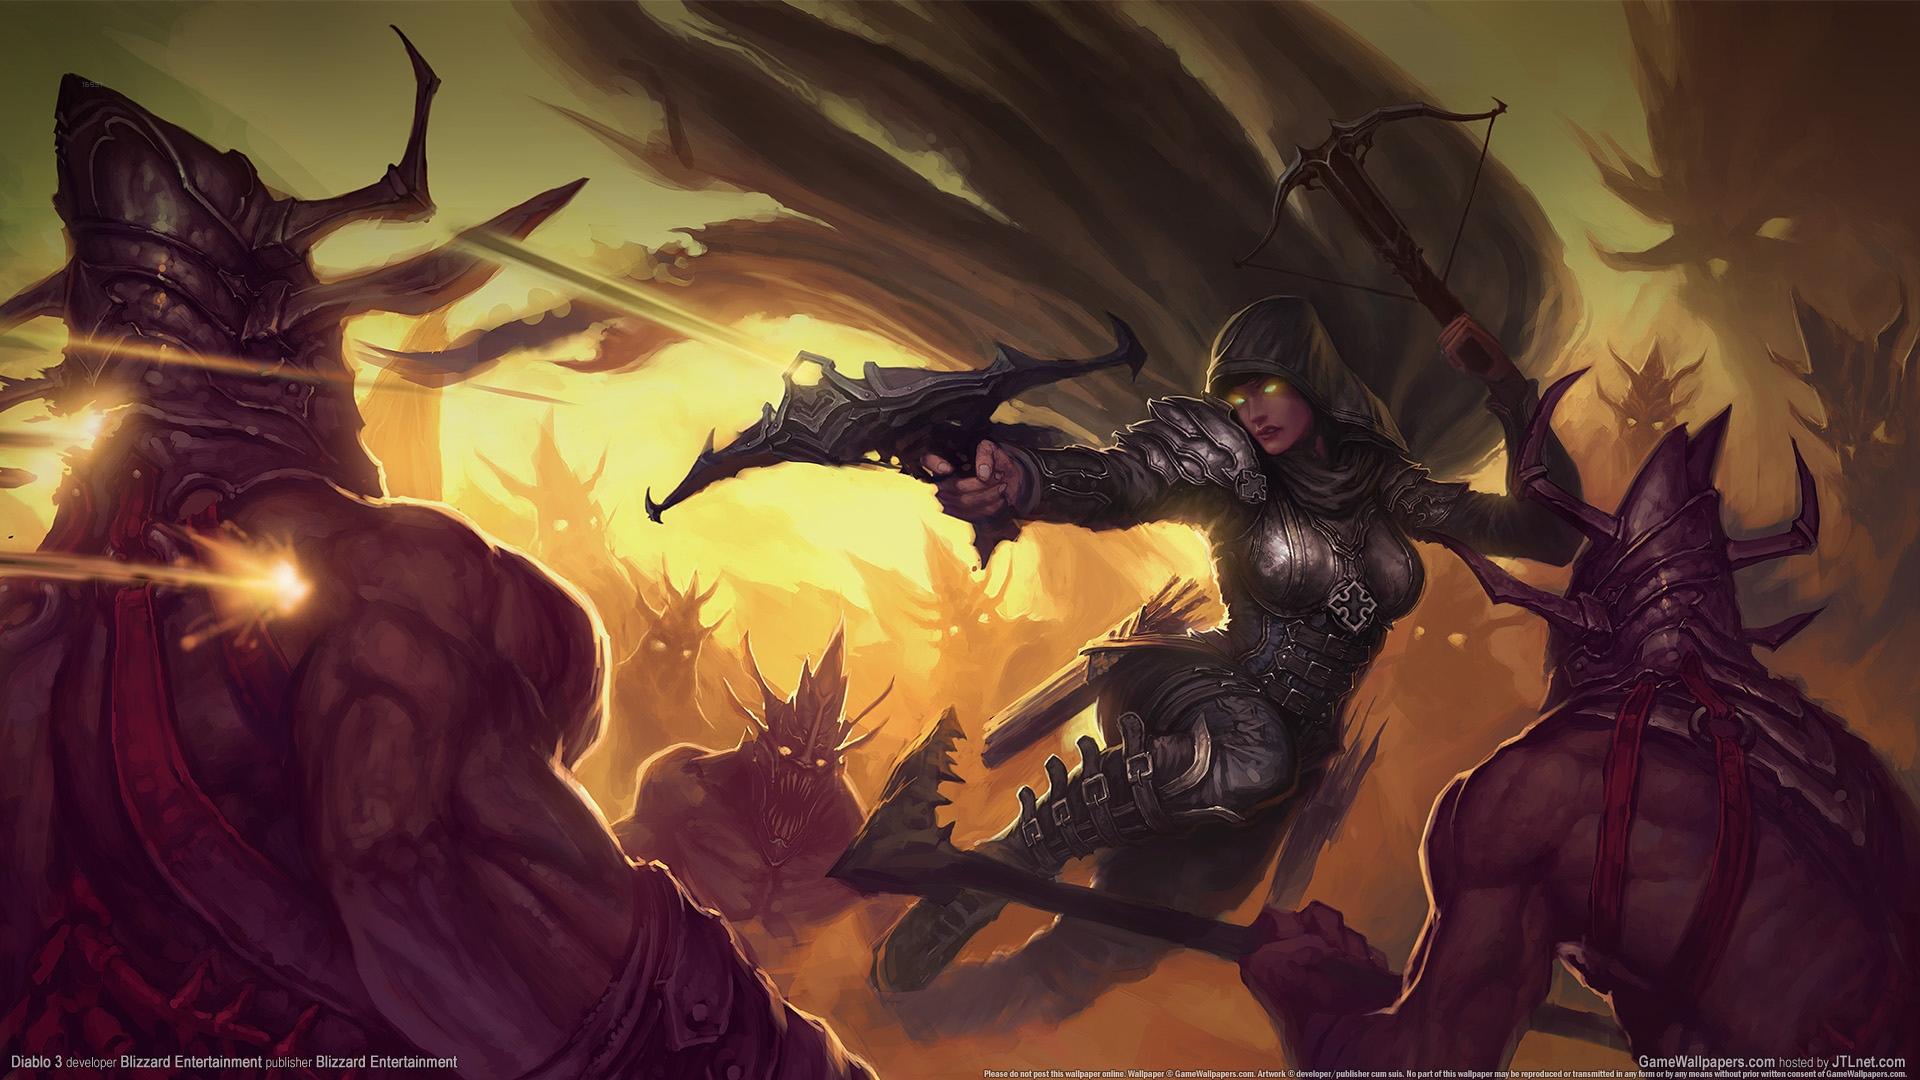 Free Download Diablo 3 Demon Hunter Wallpaper 202977 1920x1080